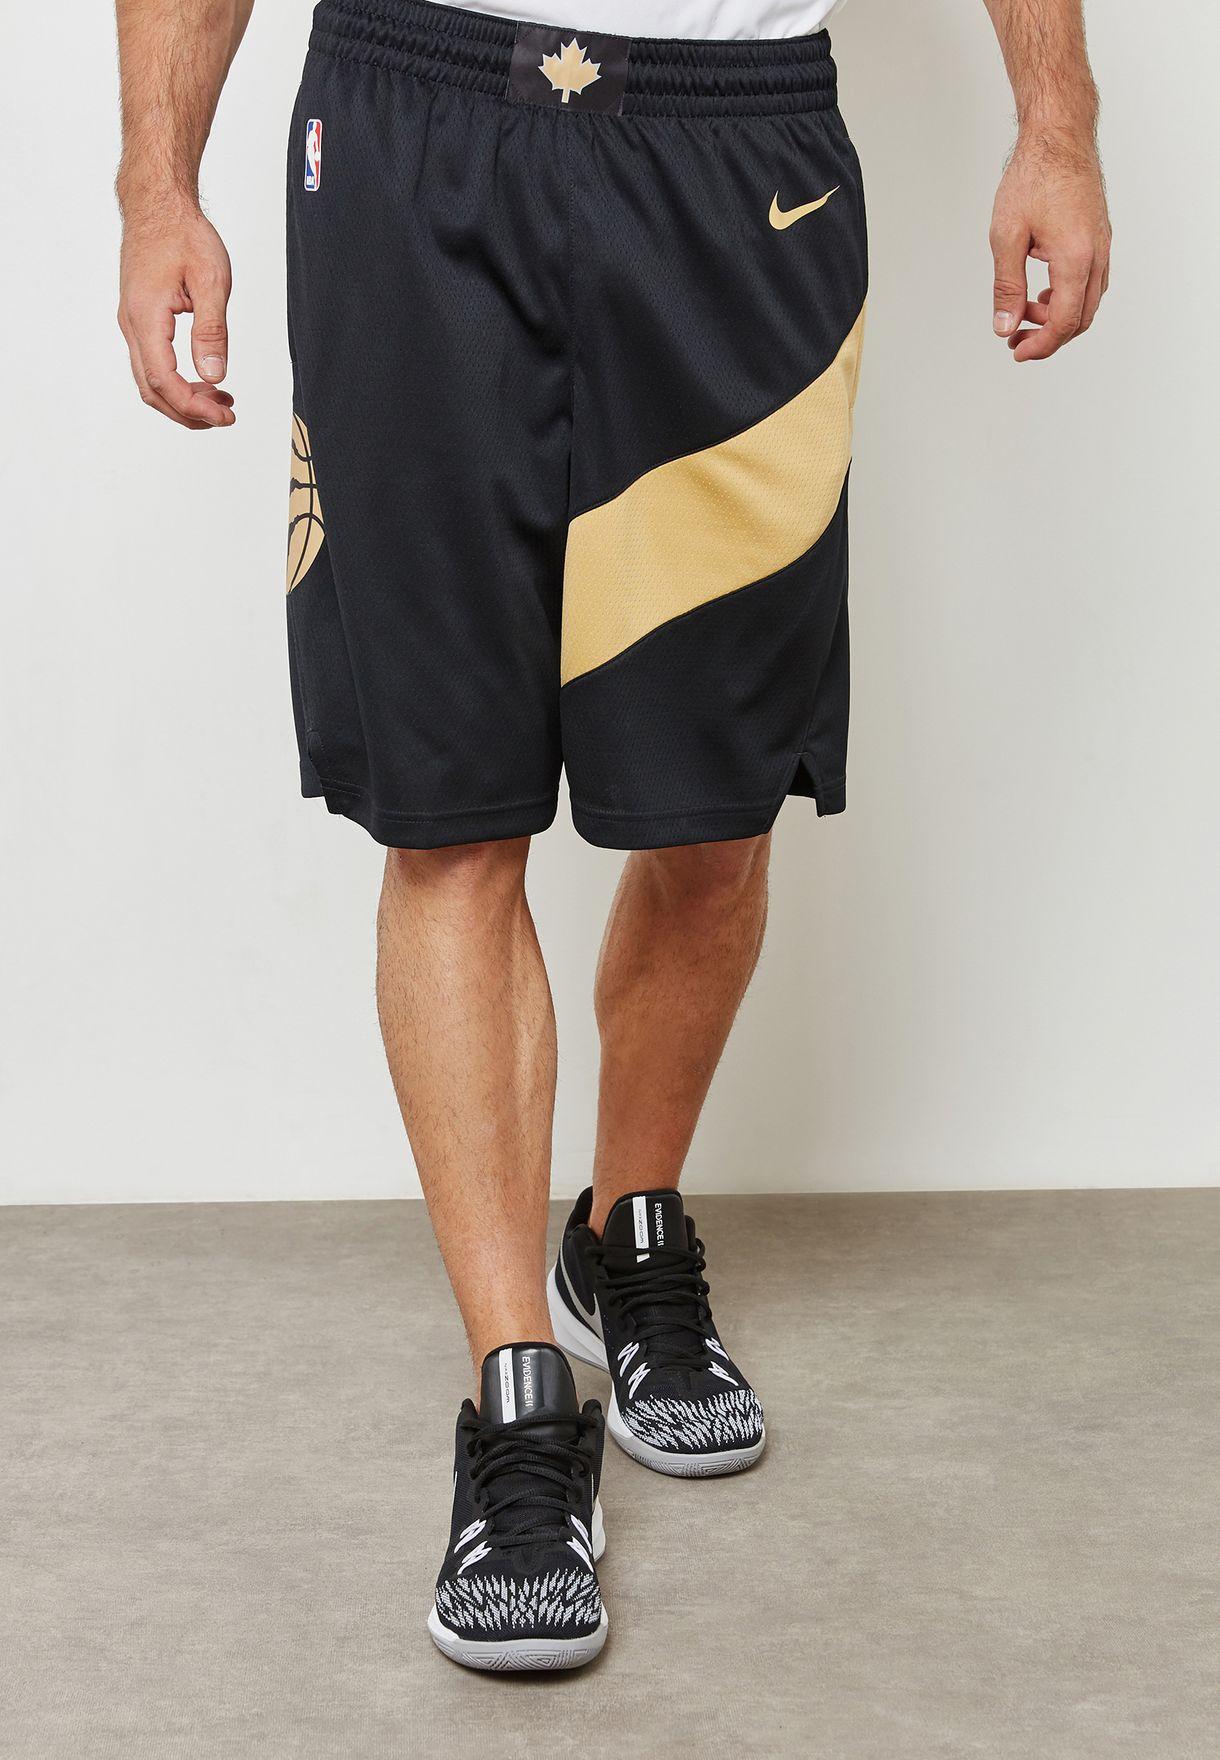 detailed look 214cc 4e44b Toronto Raptors Swingman Shorts